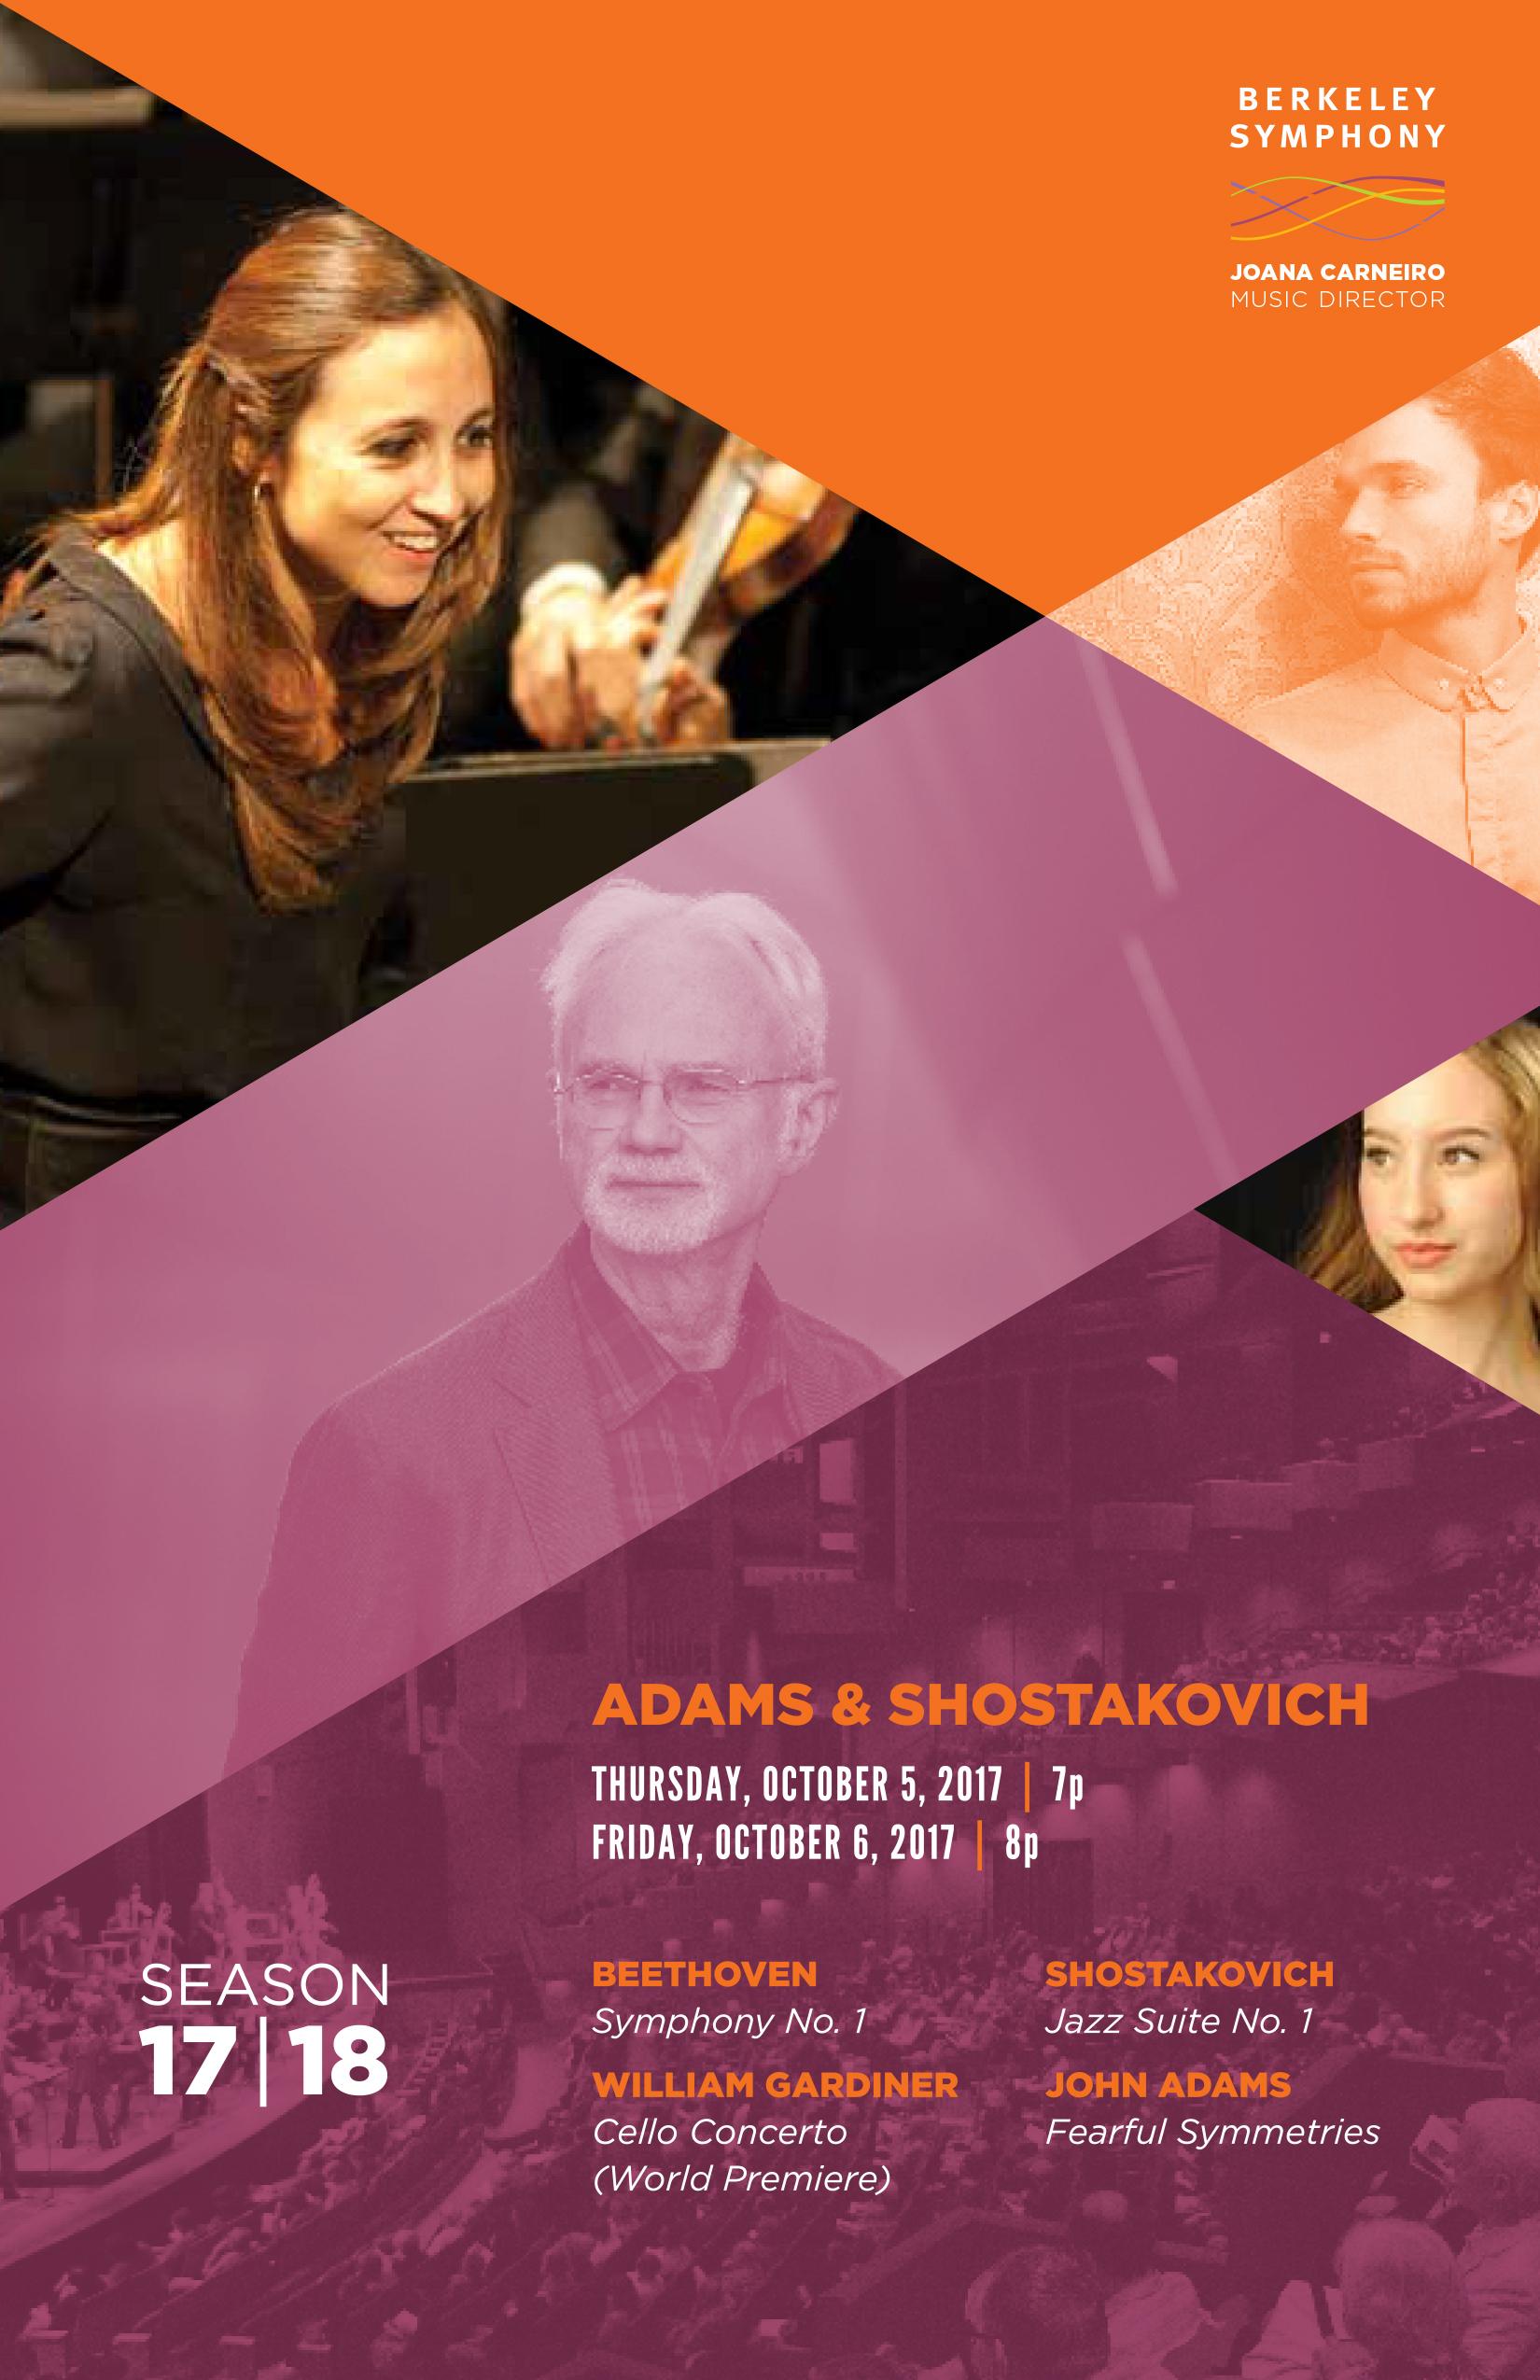 Oct 5&6, 2017 - Adams & Shostakovich